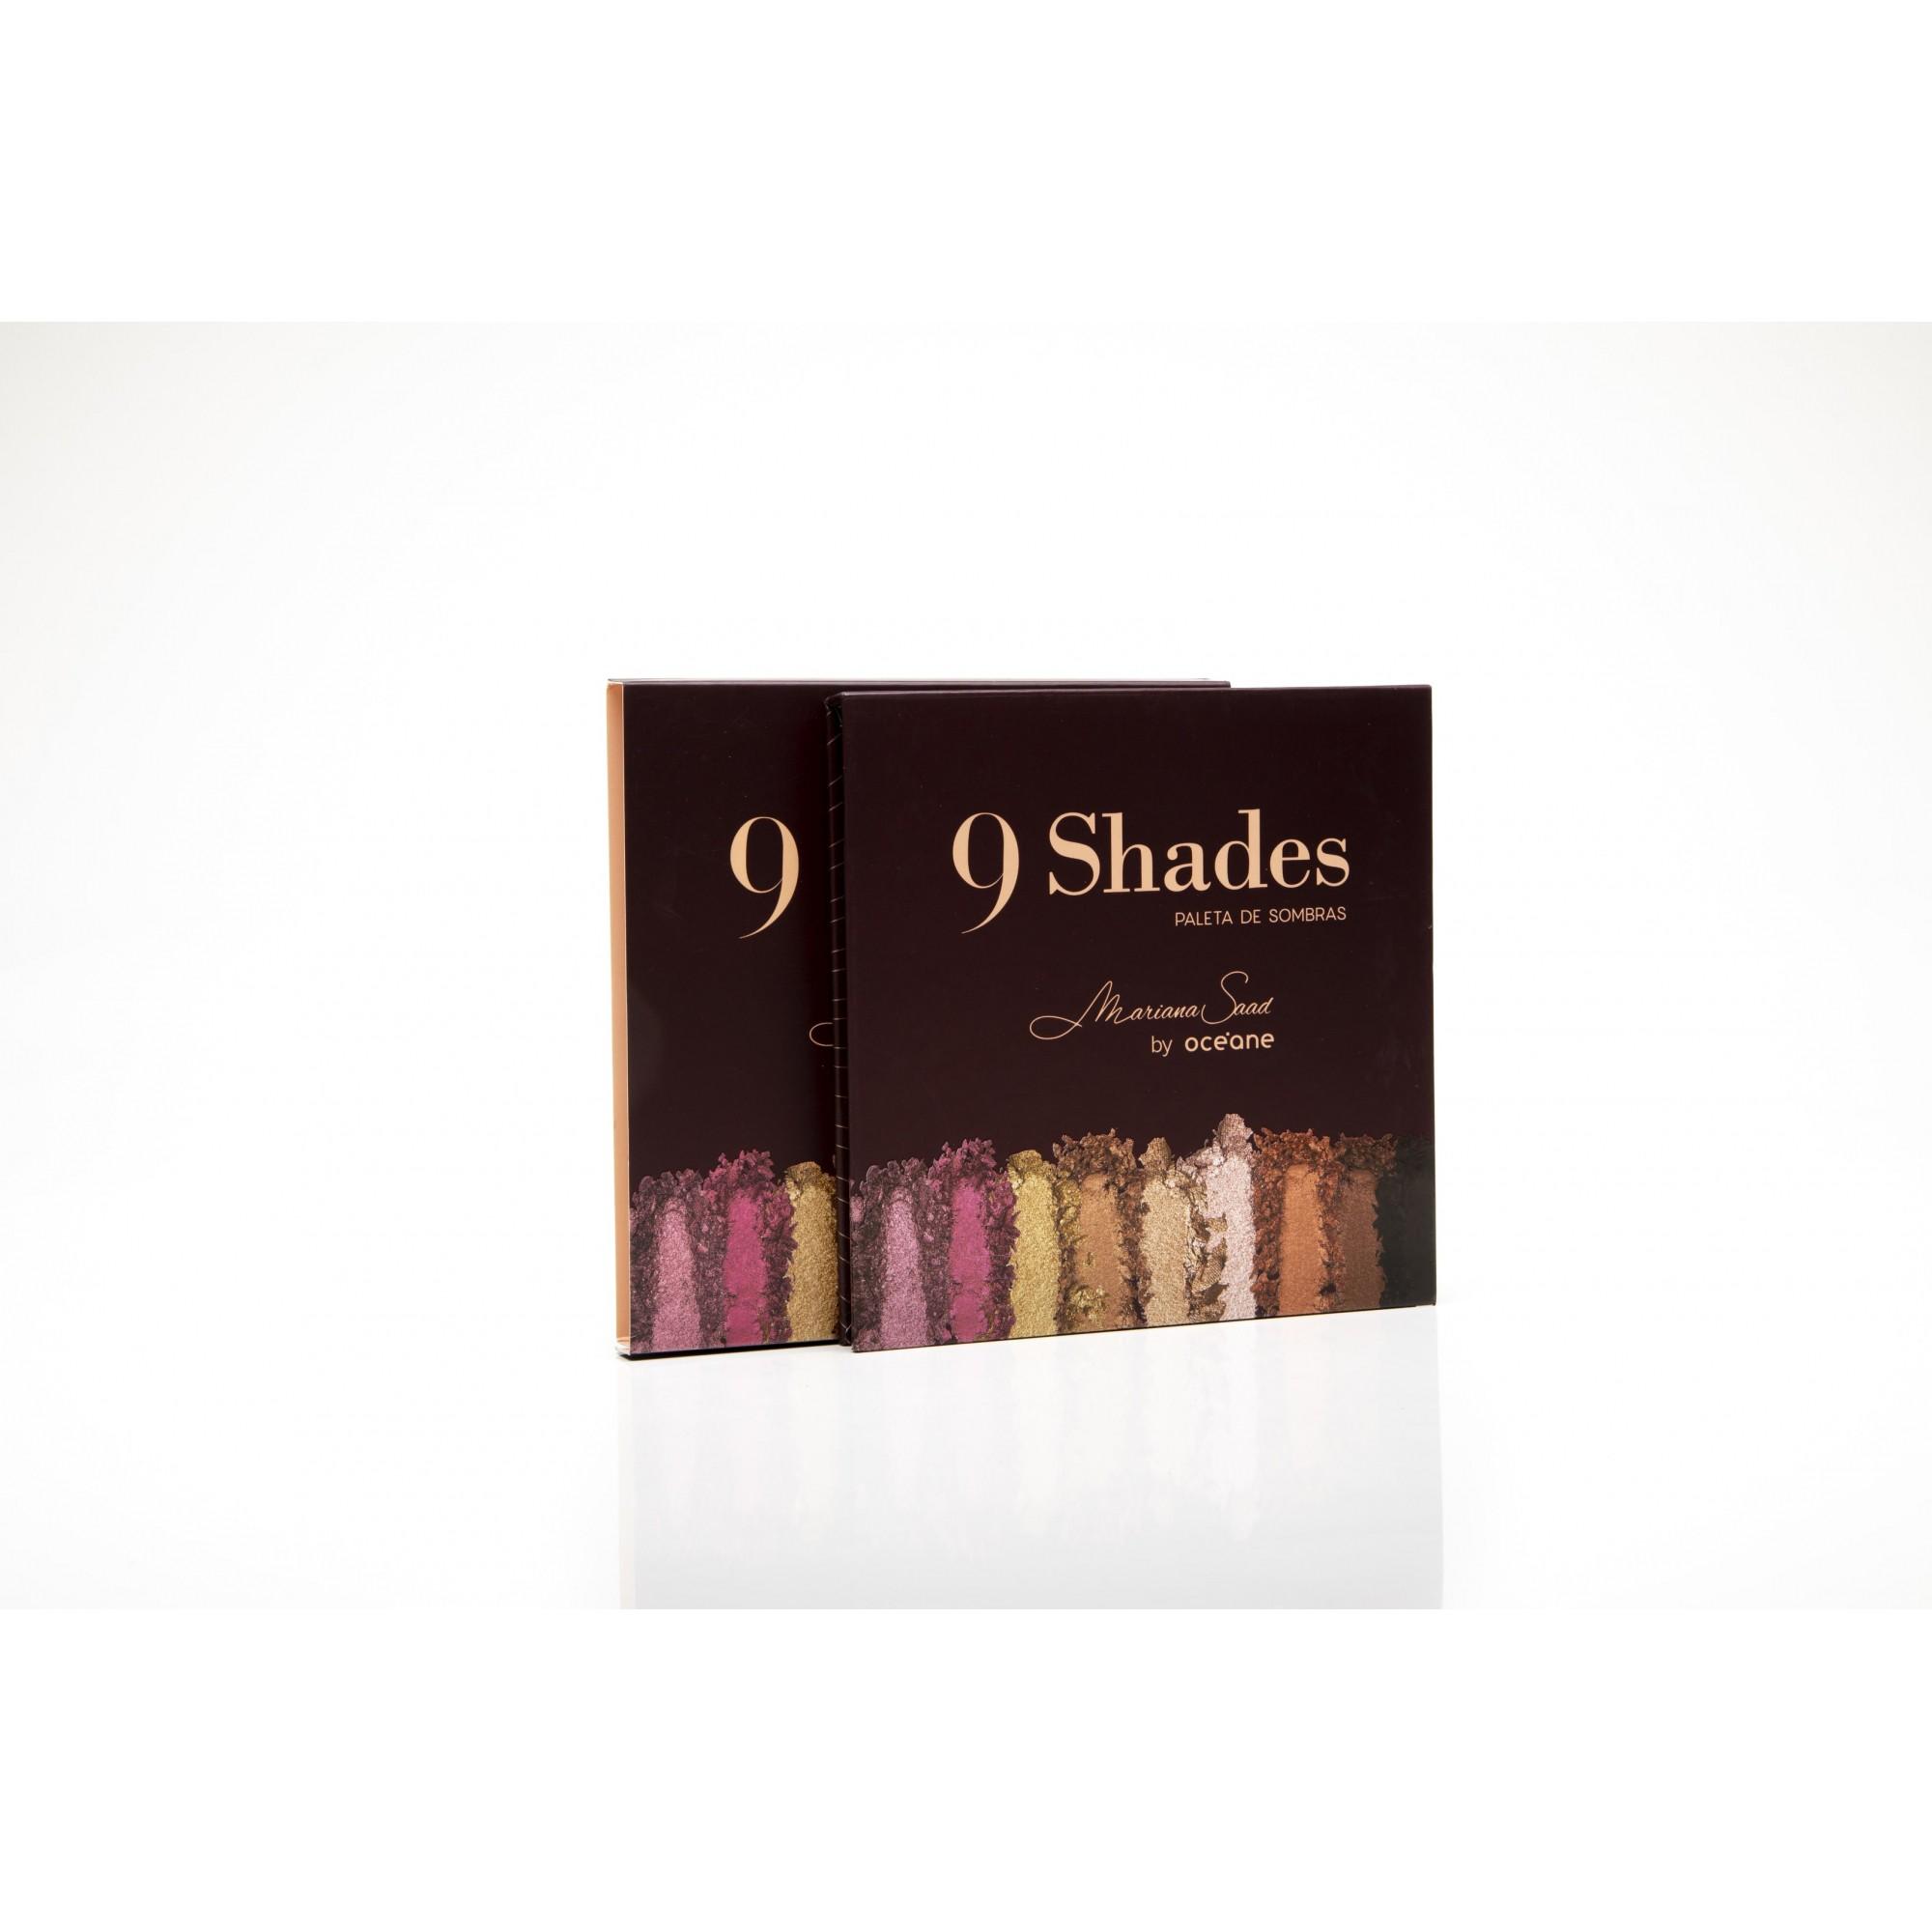 Paleta de sombras mariana saad - 9 shades